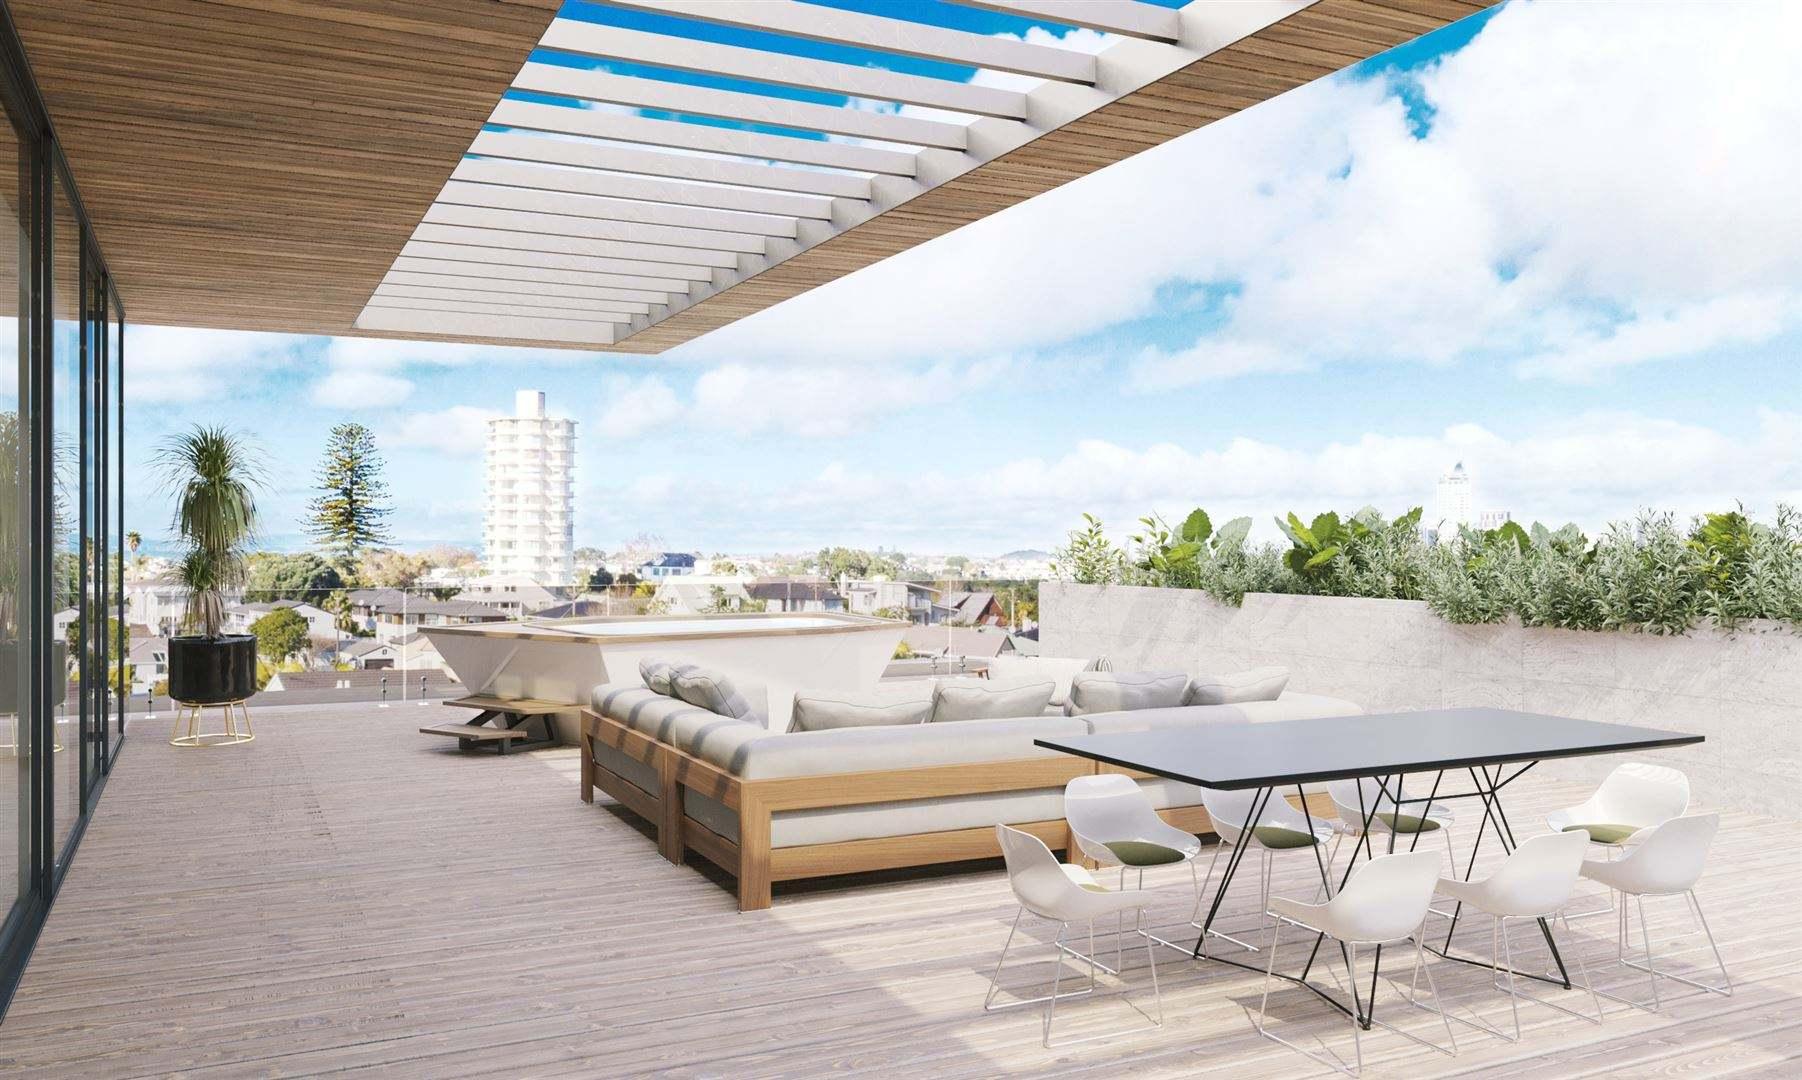 Milford 4房 Milford 110顶层奢寓 Milford桂冠上的明珠 360°无敌视野 与湖海为伴 2021年1月开建! Penthouse 110 - The Crown Jewel of Milford